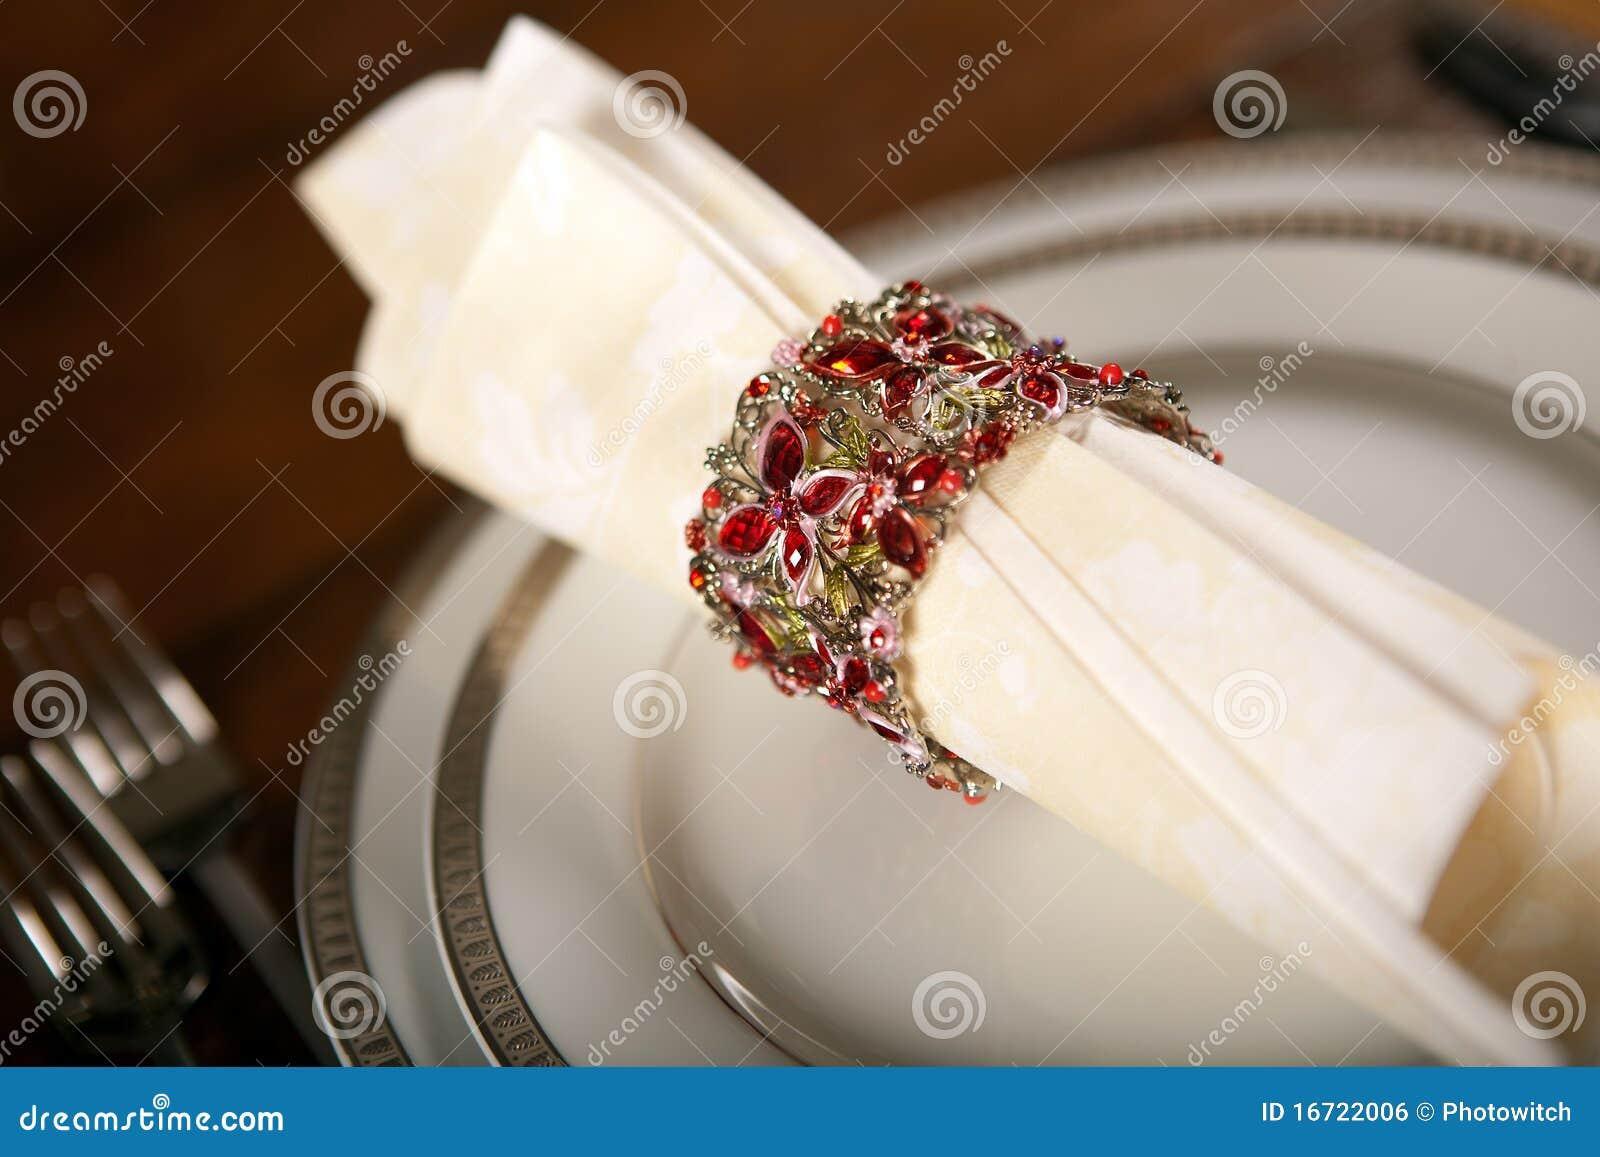 Holiday Napkin Ring 3 Stock Photo Image Of Dine